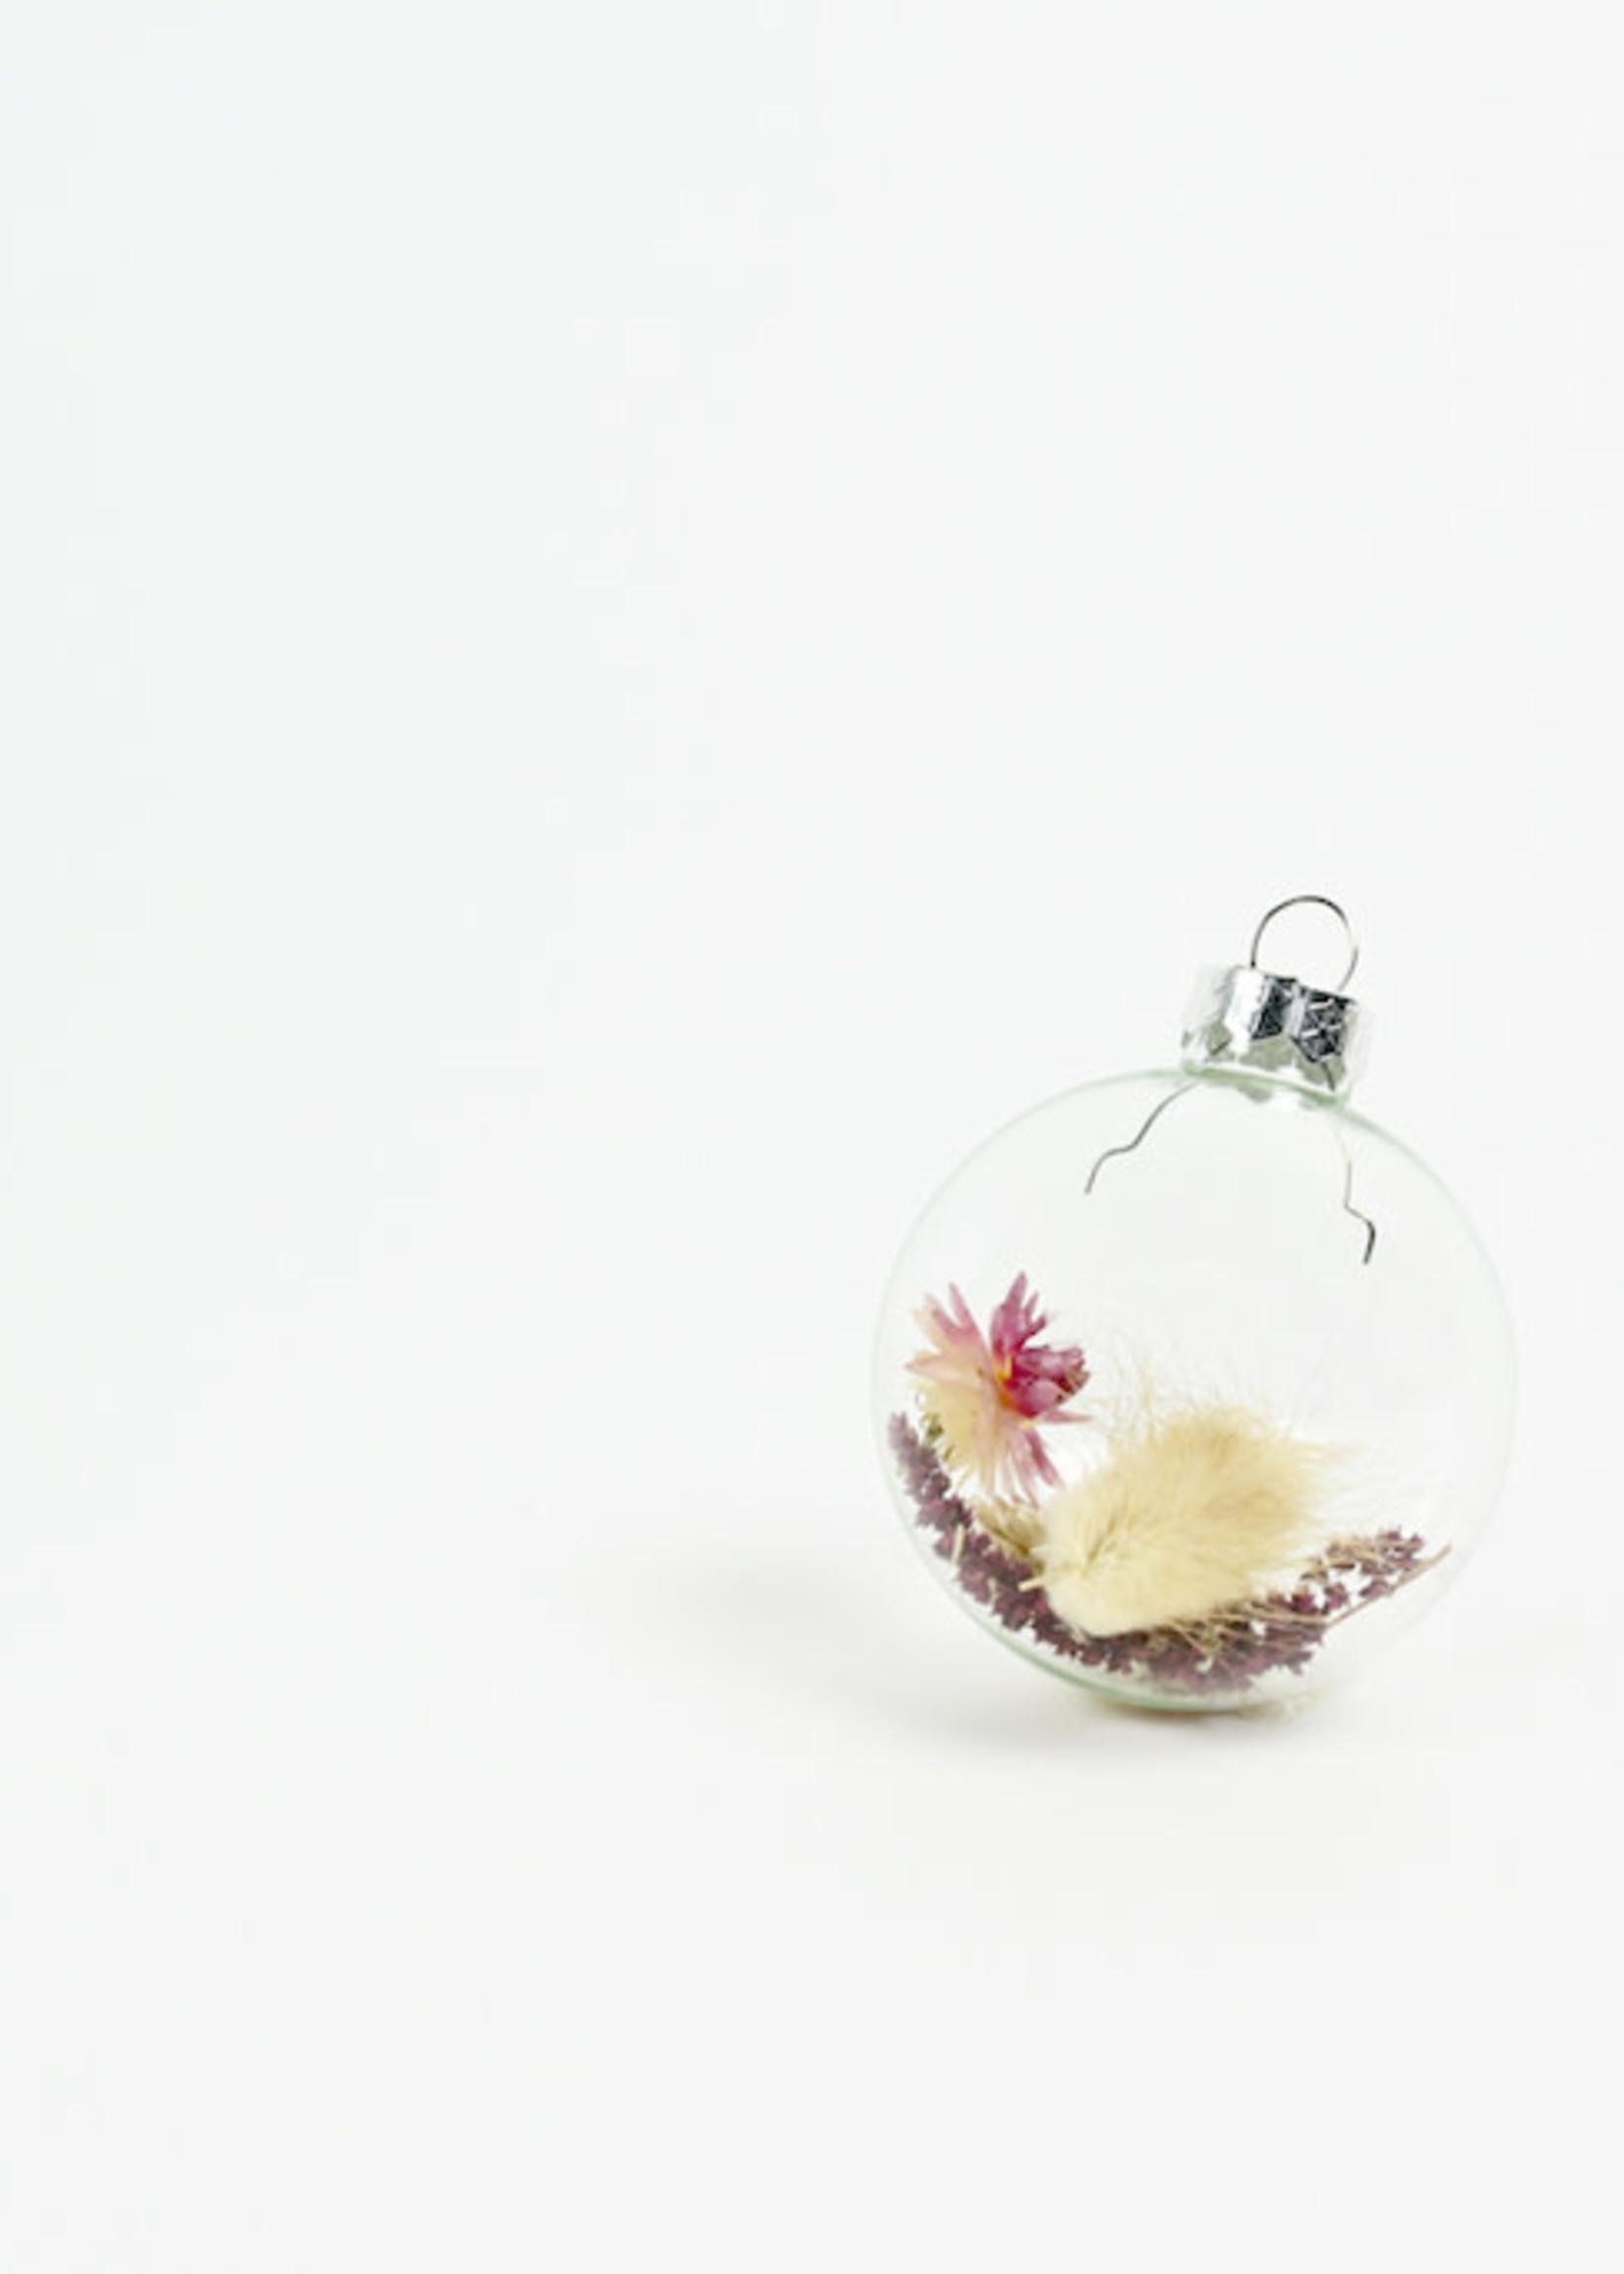 Mood Kerstbal met droogbloemen